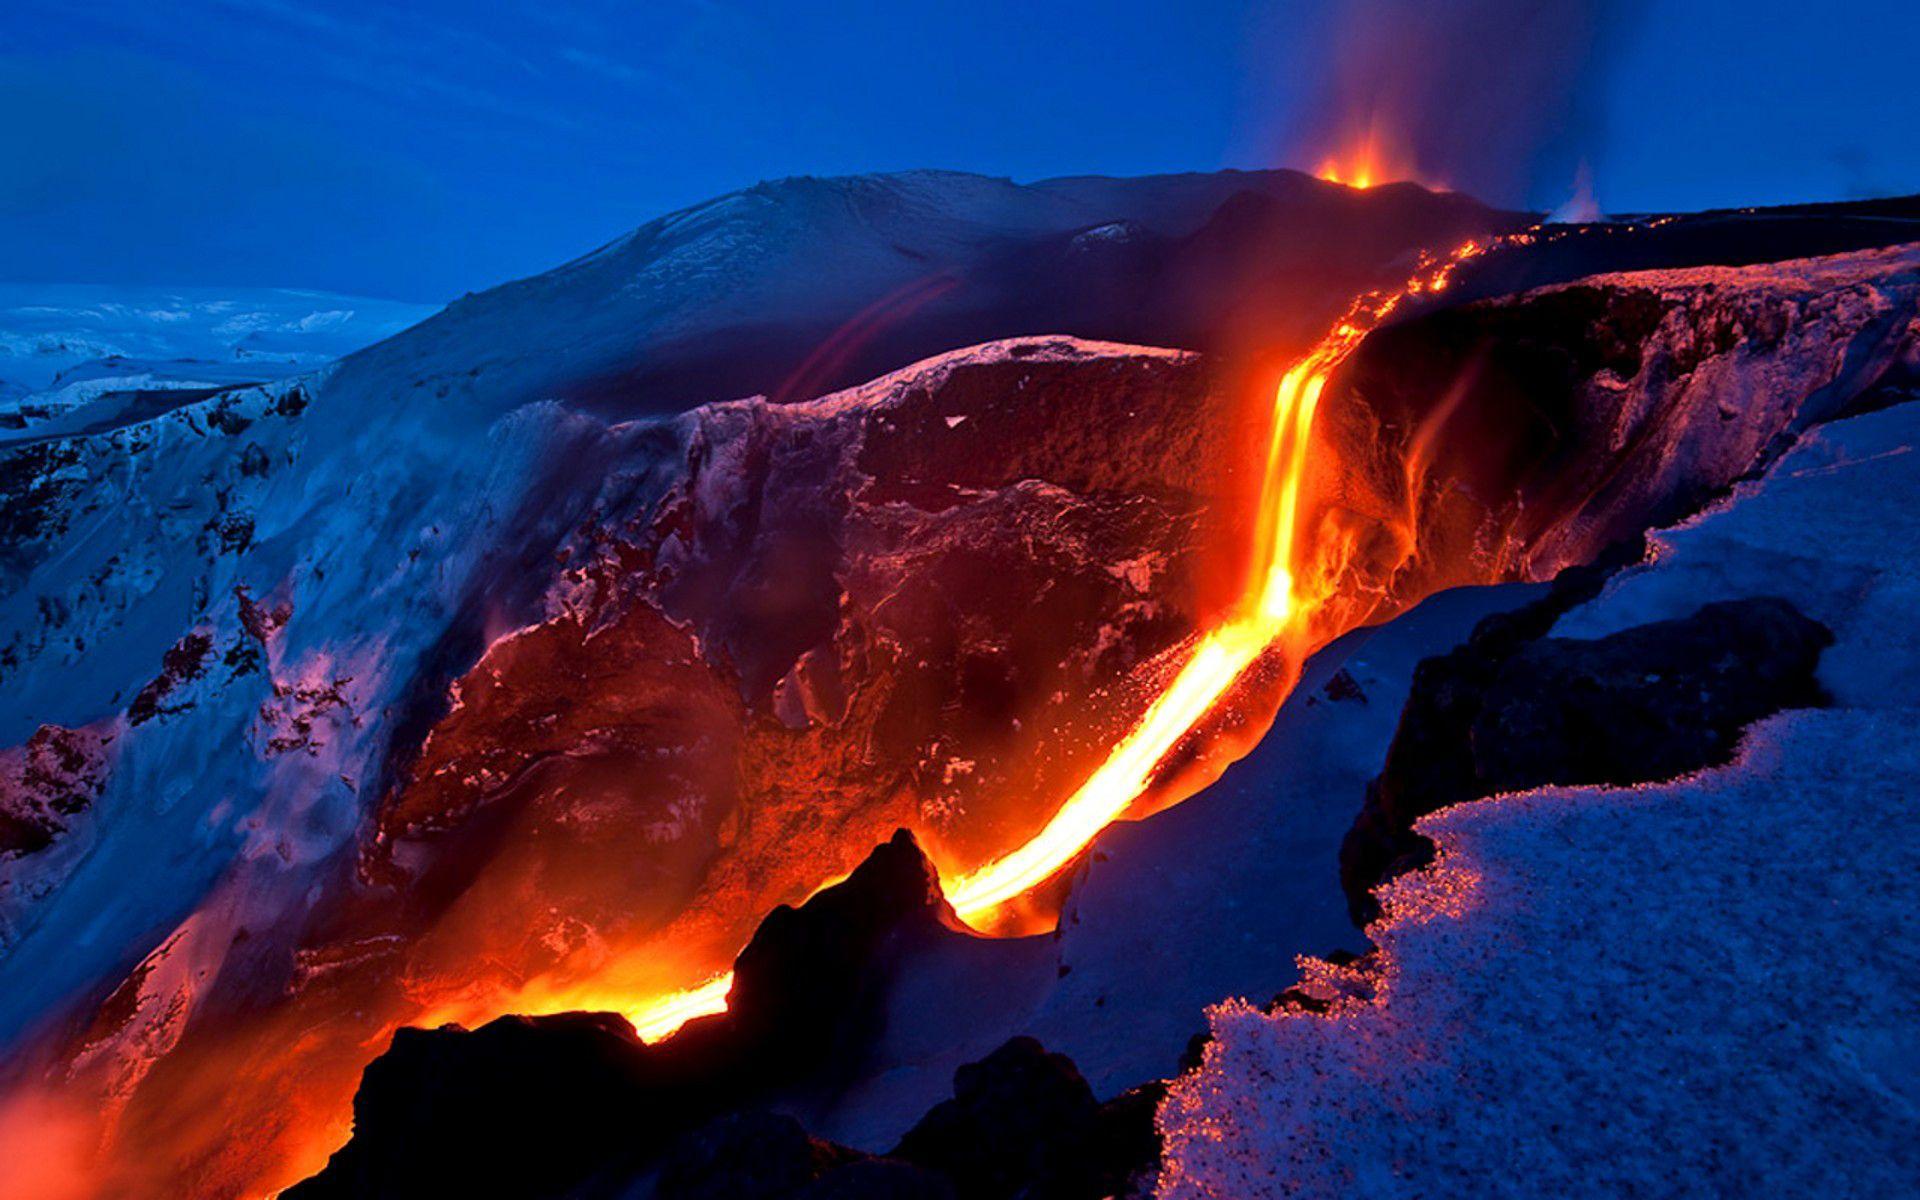 volcanoes on earth Earth Volcano WallpaperBackground 1920 x 1920x1200